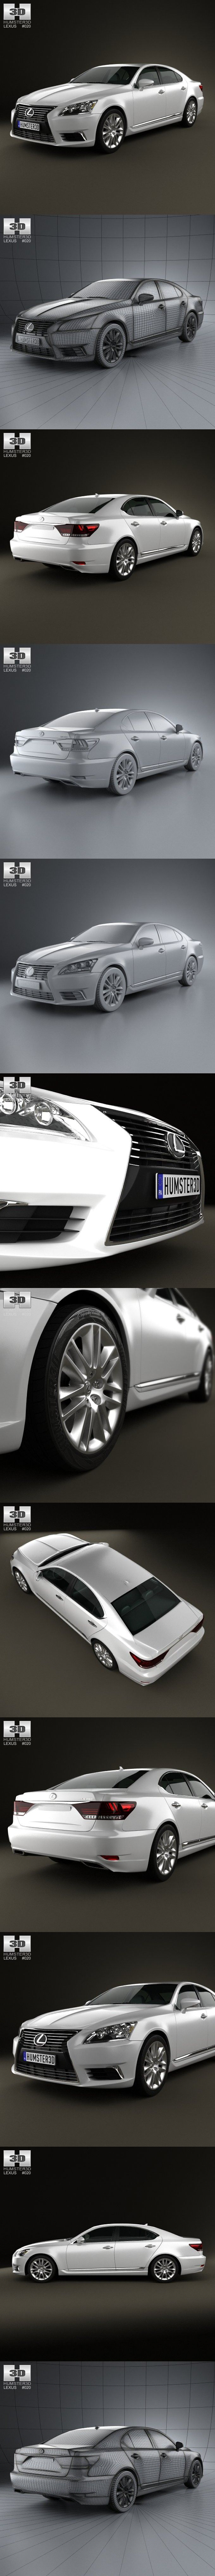 LS-LAND ls-model ls-magazine ls-island Lexus LS (XF40) 2012. 3D Vehicles